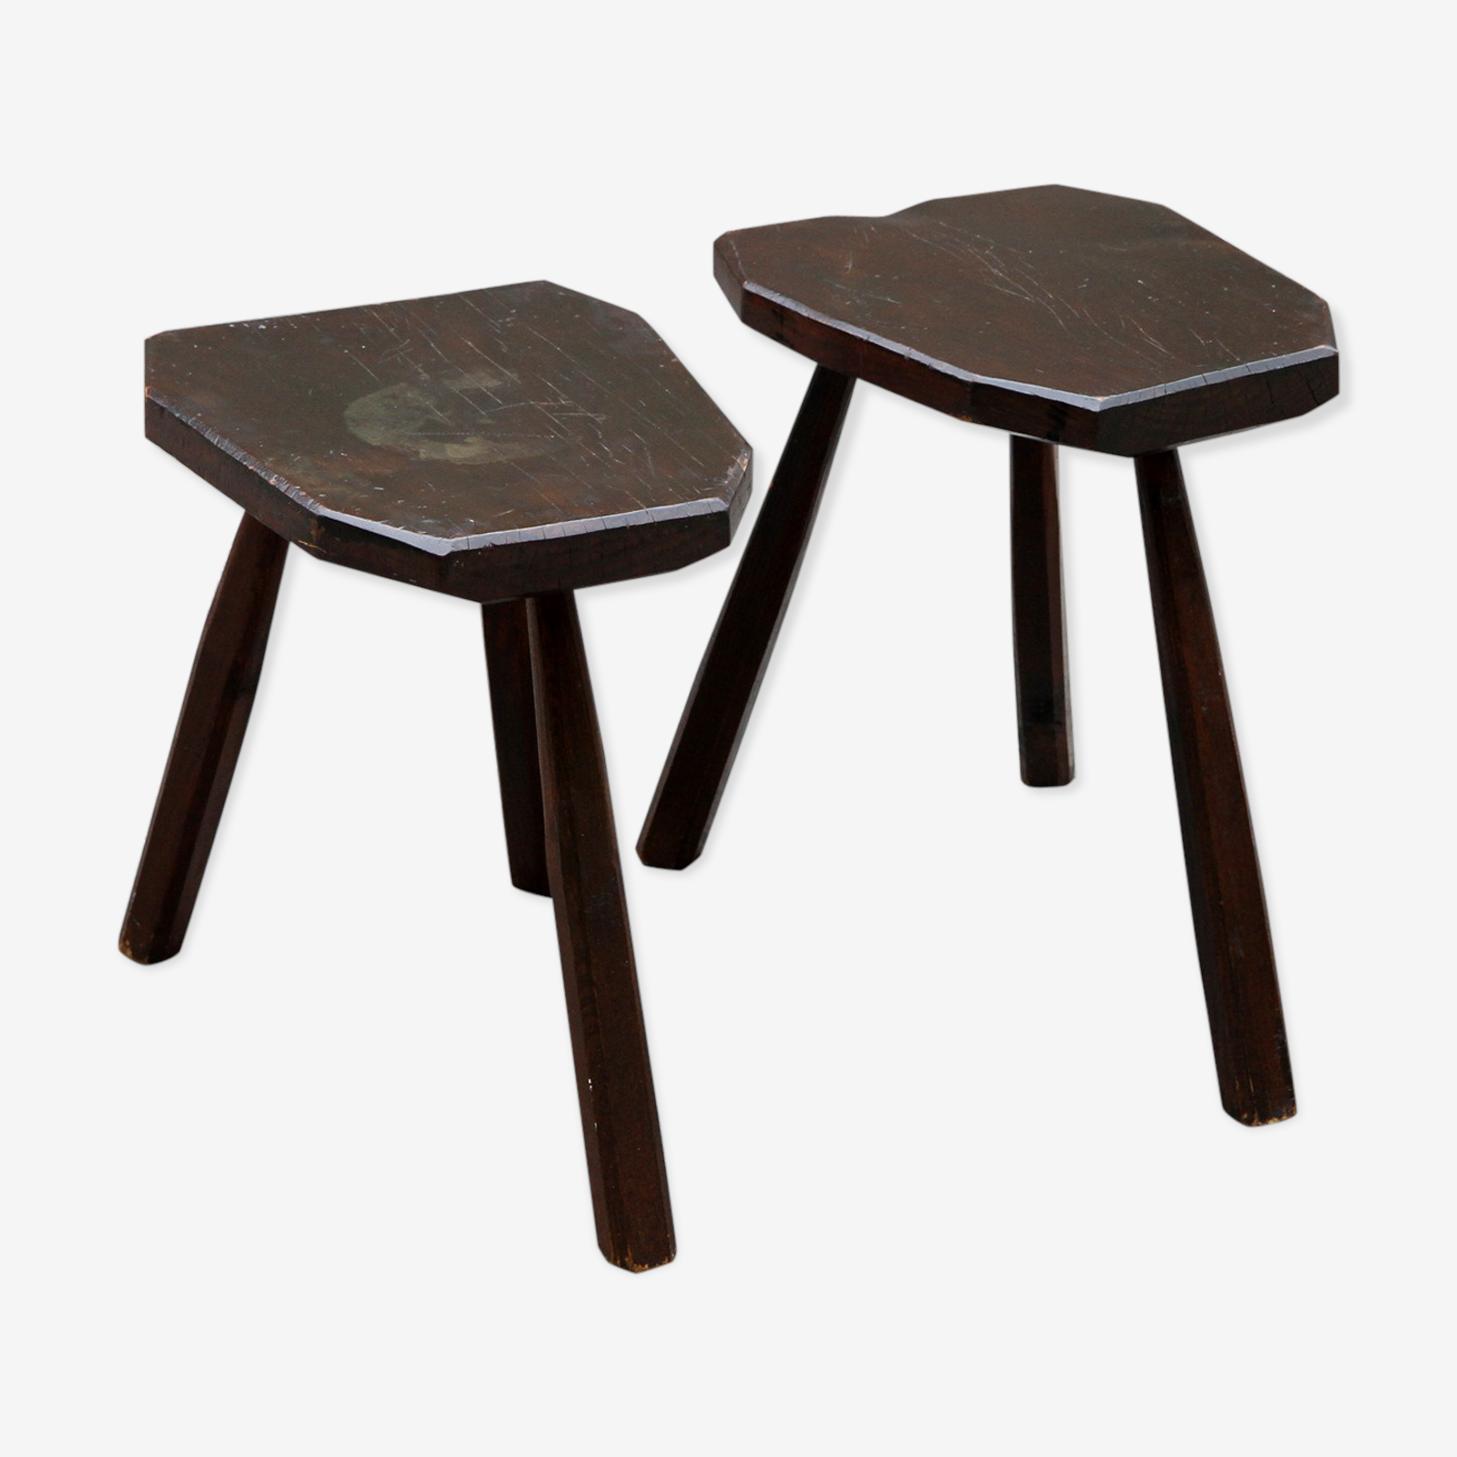 Pair of stools brutalist tripod